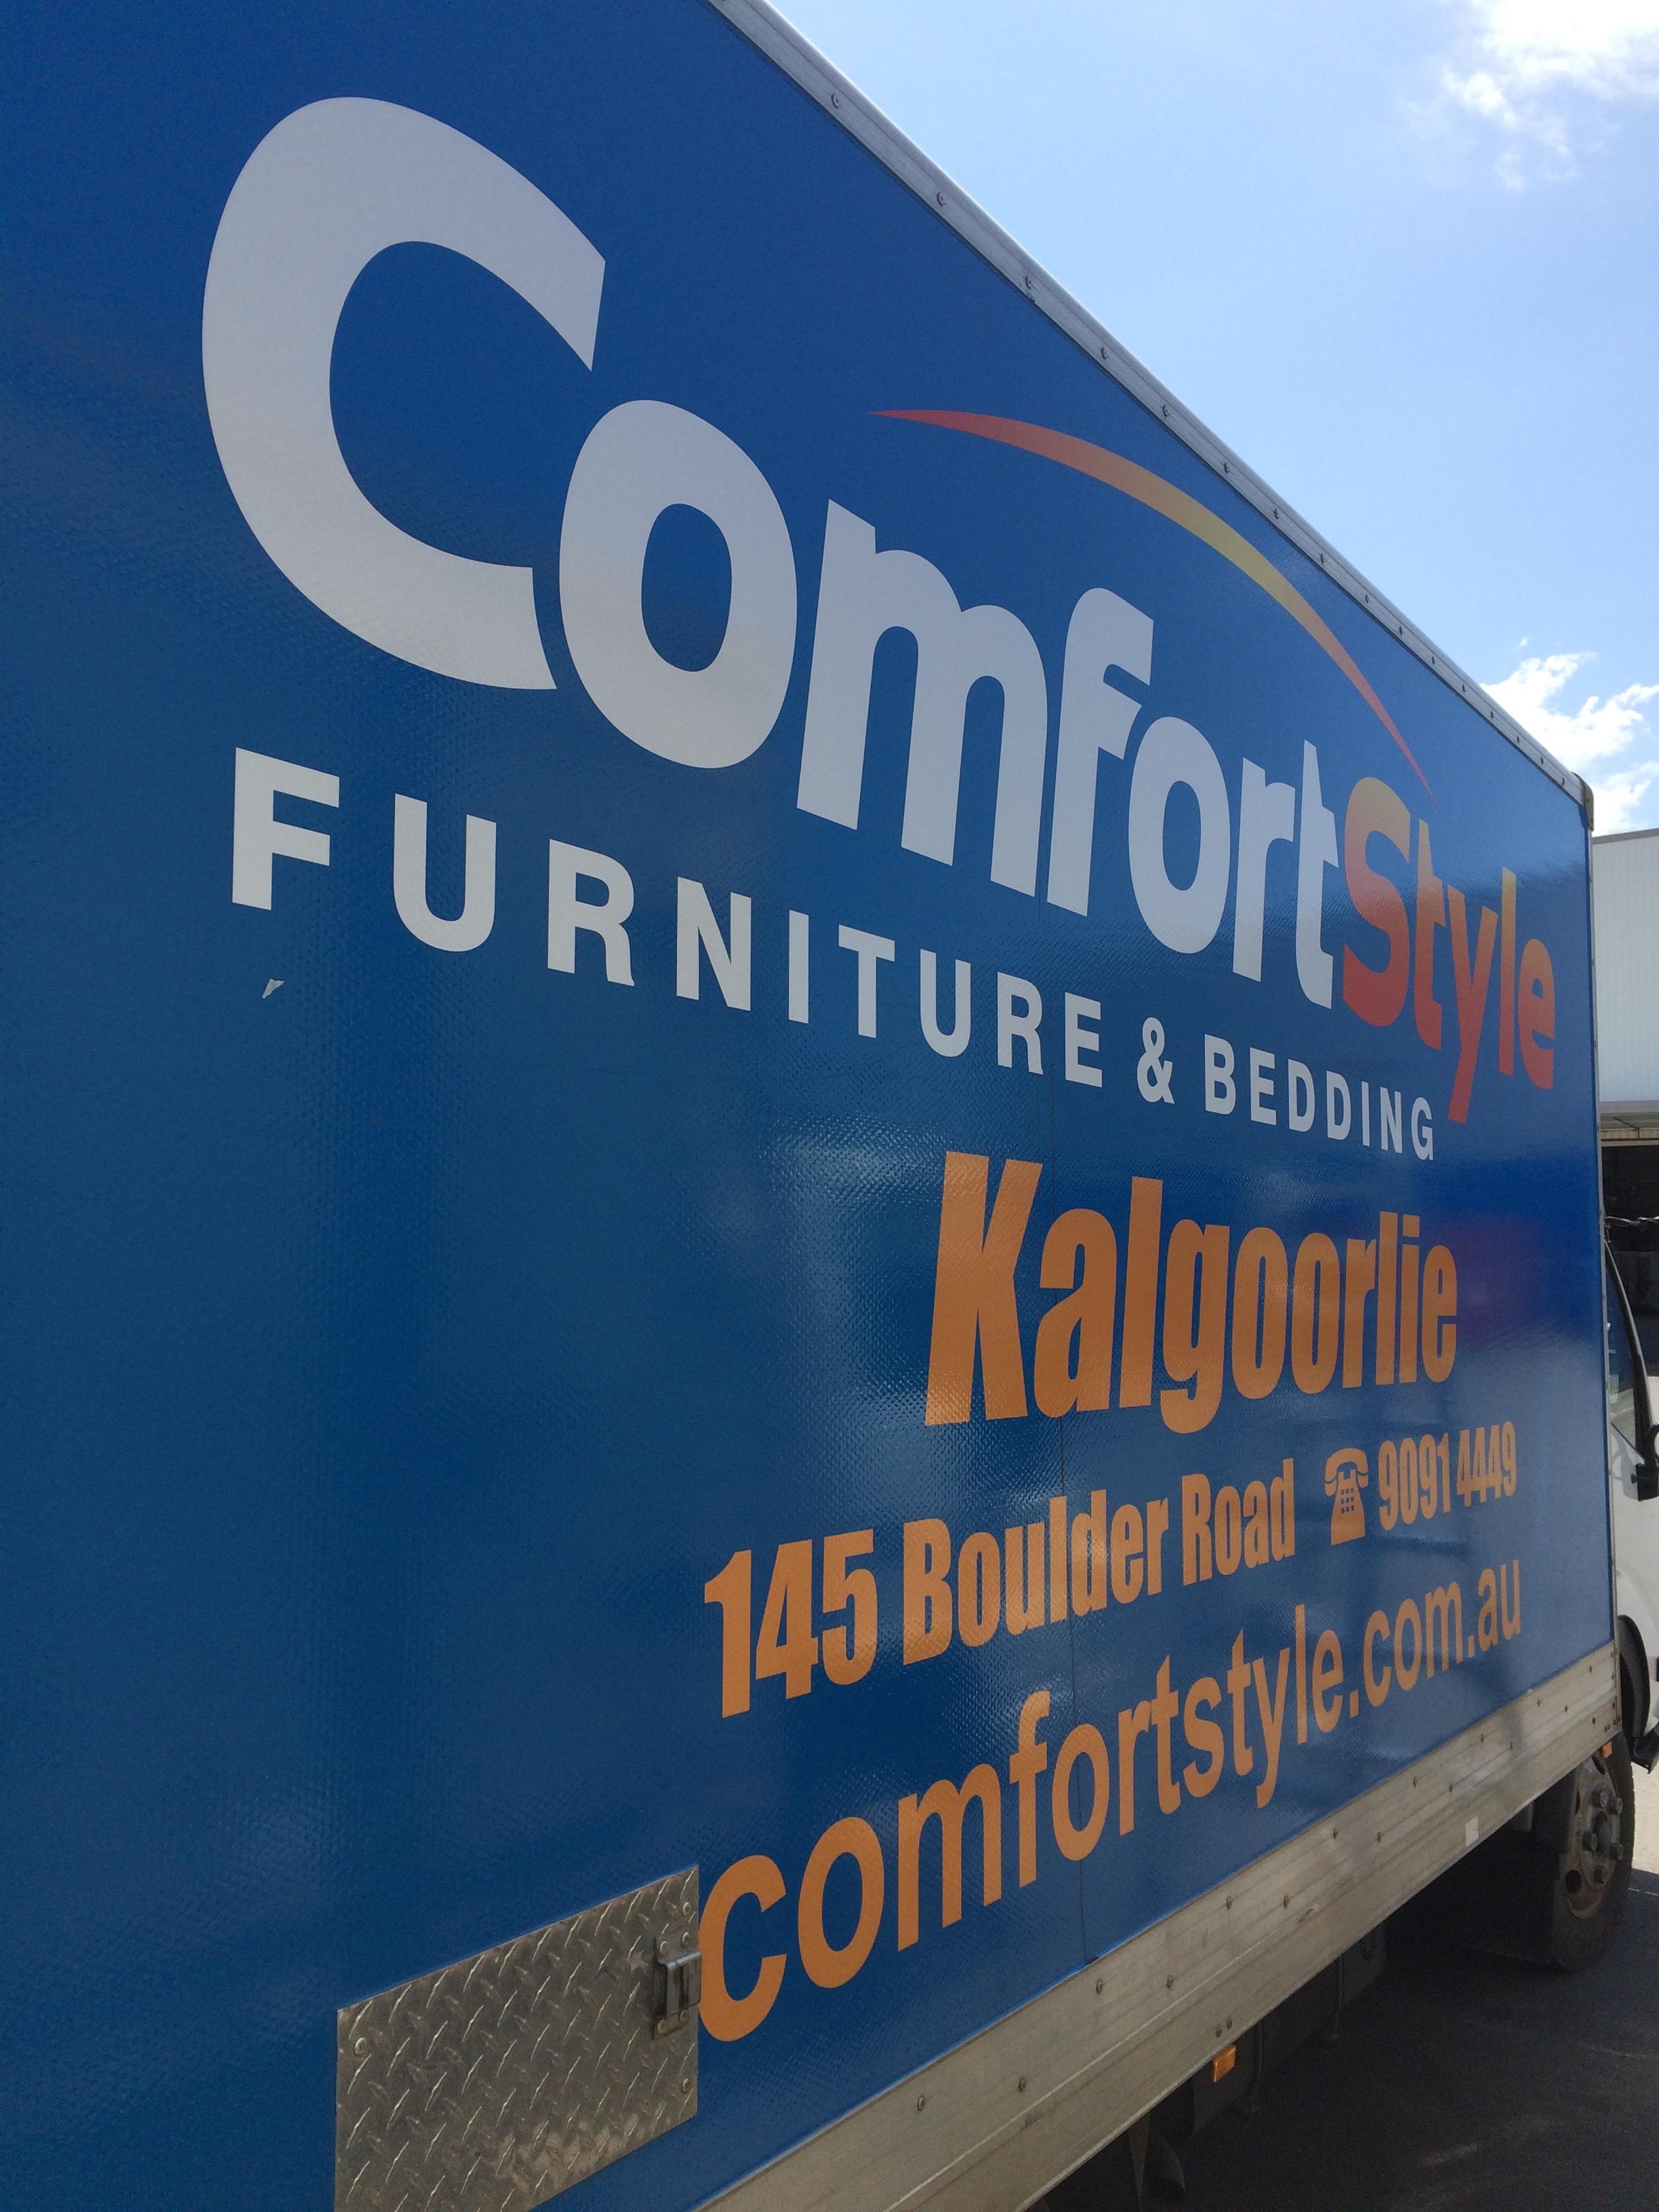 Comfort Style